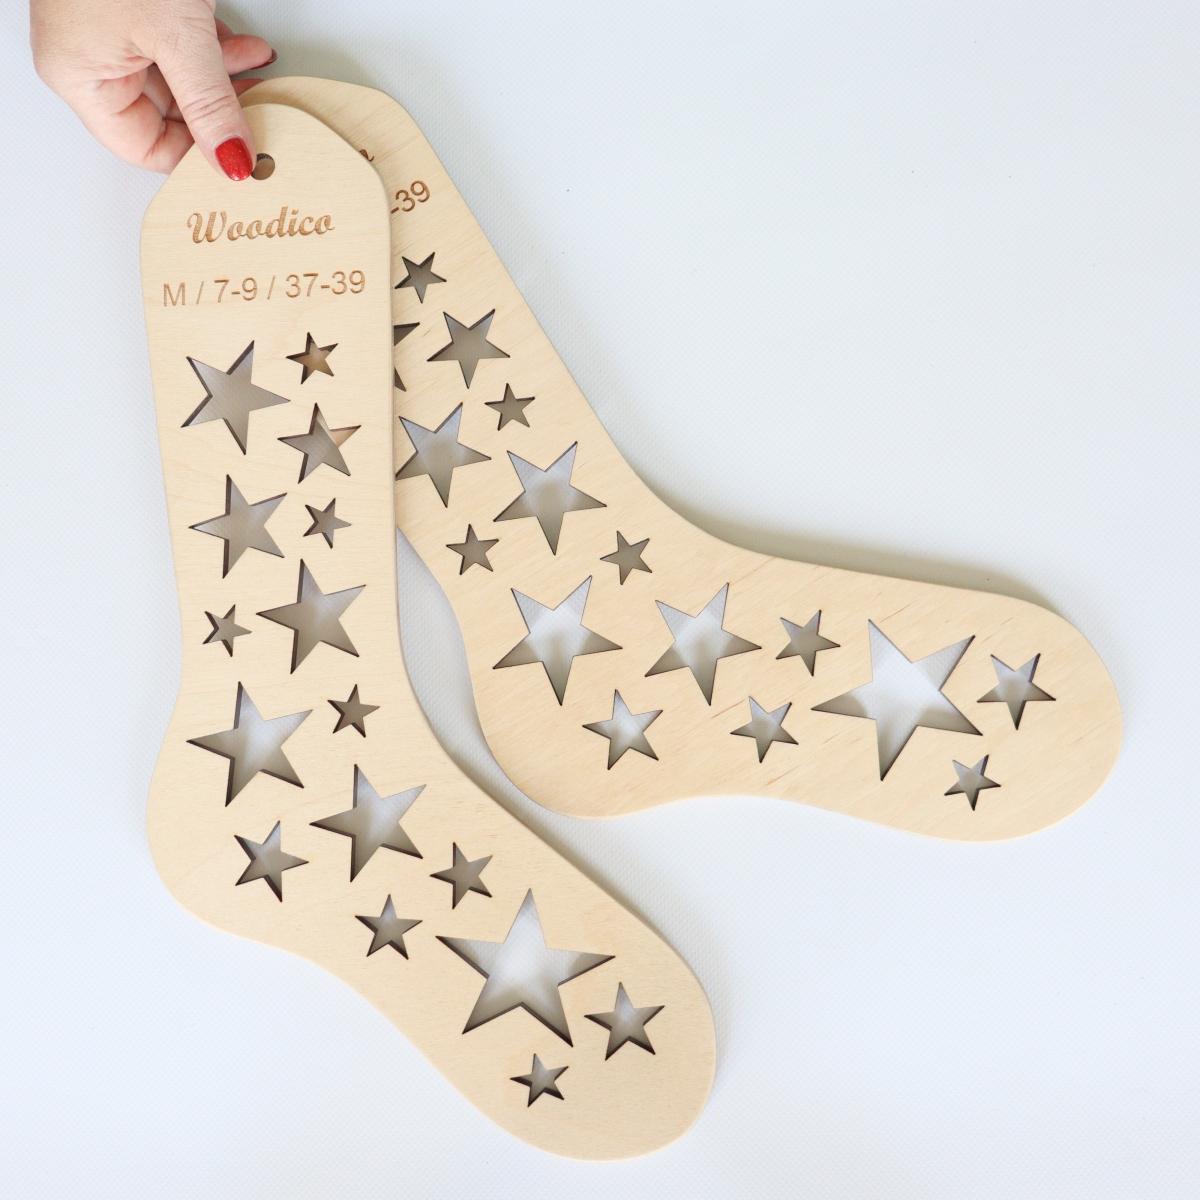 woodico.pro wooden sock blockers stars 8 1200x1200 - Wooden sock blockers / Stars